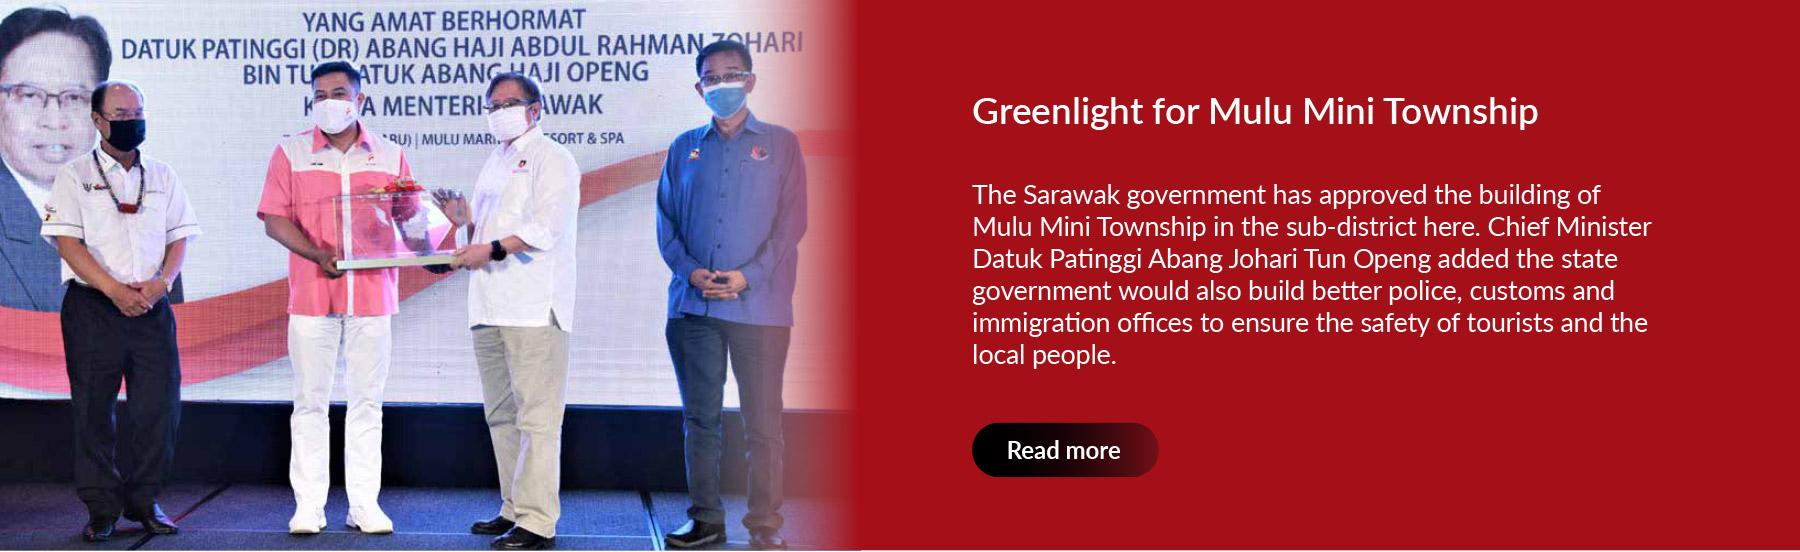 Greenlight for Mulu Mini Township